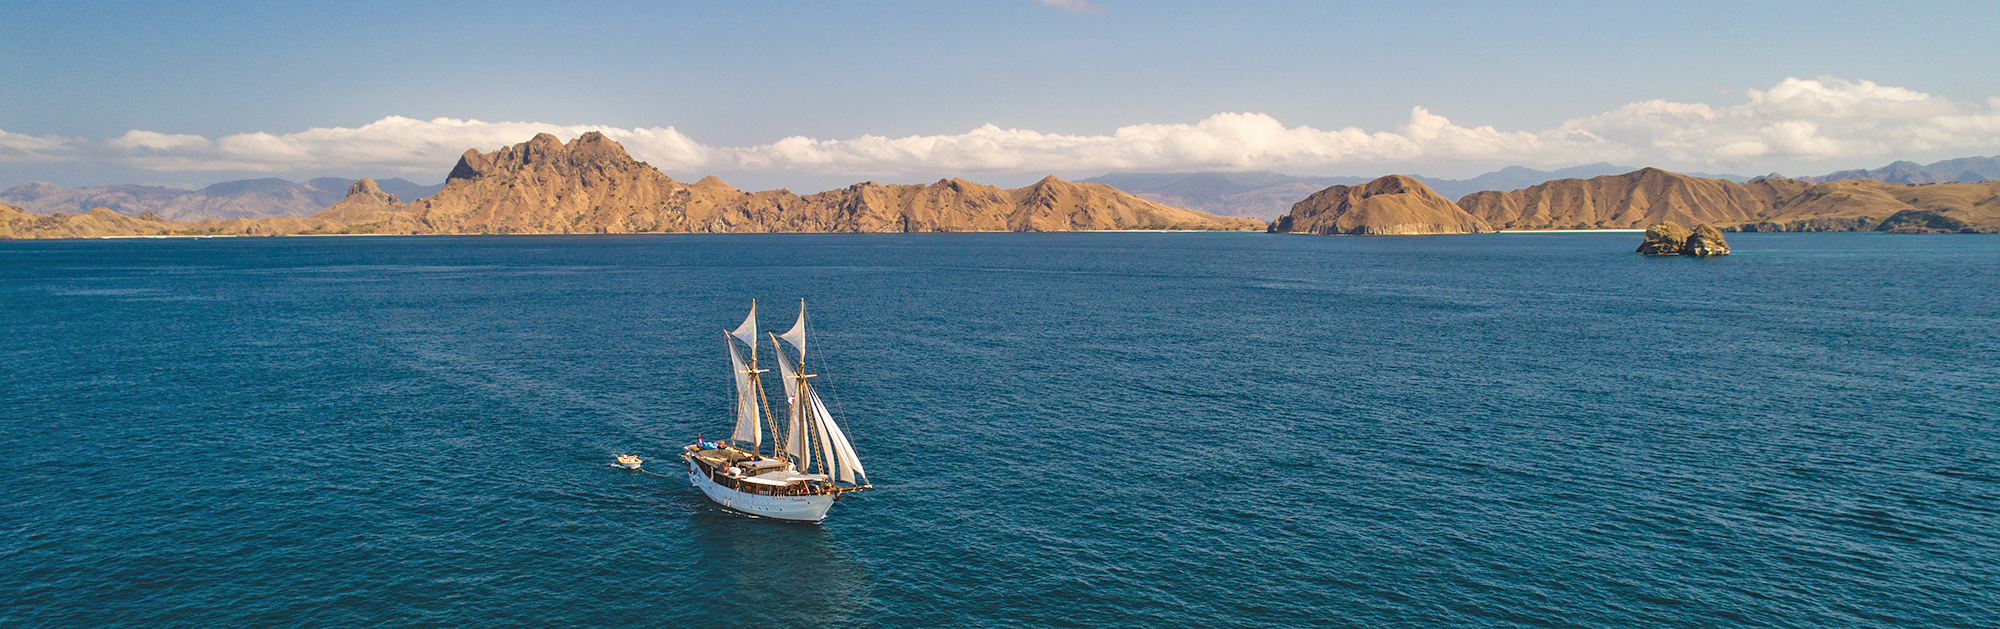 Flores sailing drone-0573.jpg